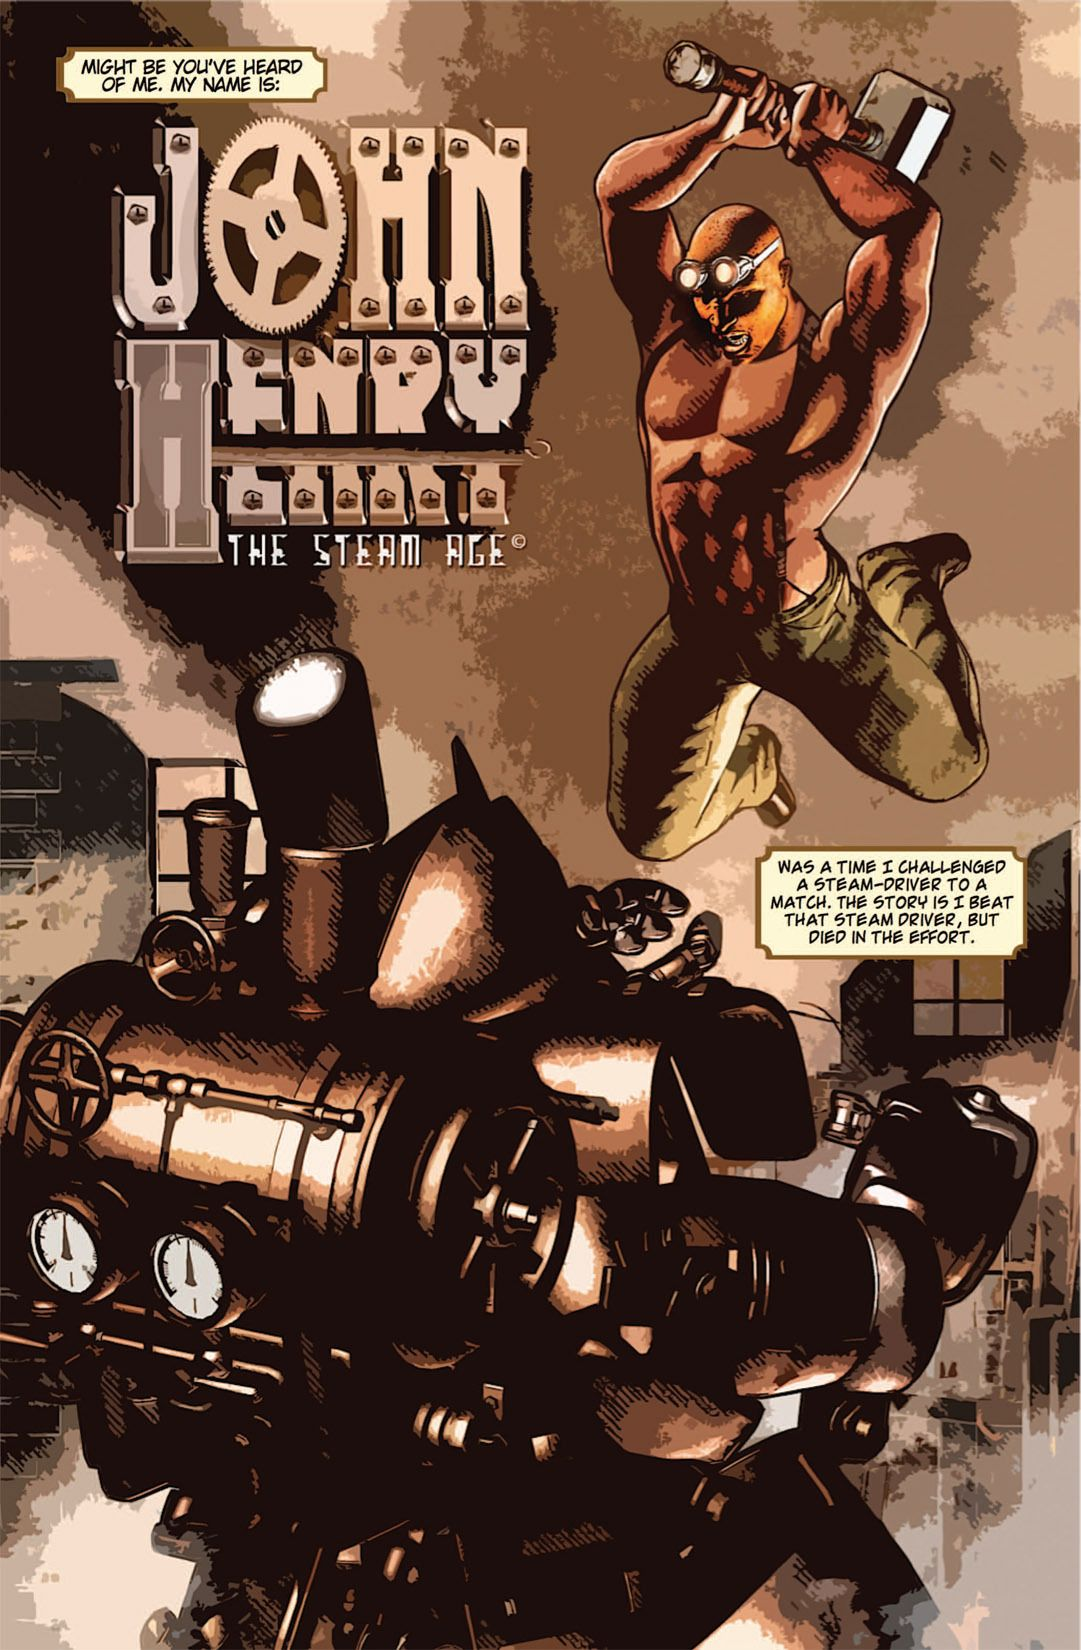 John Henry Comic Book Style